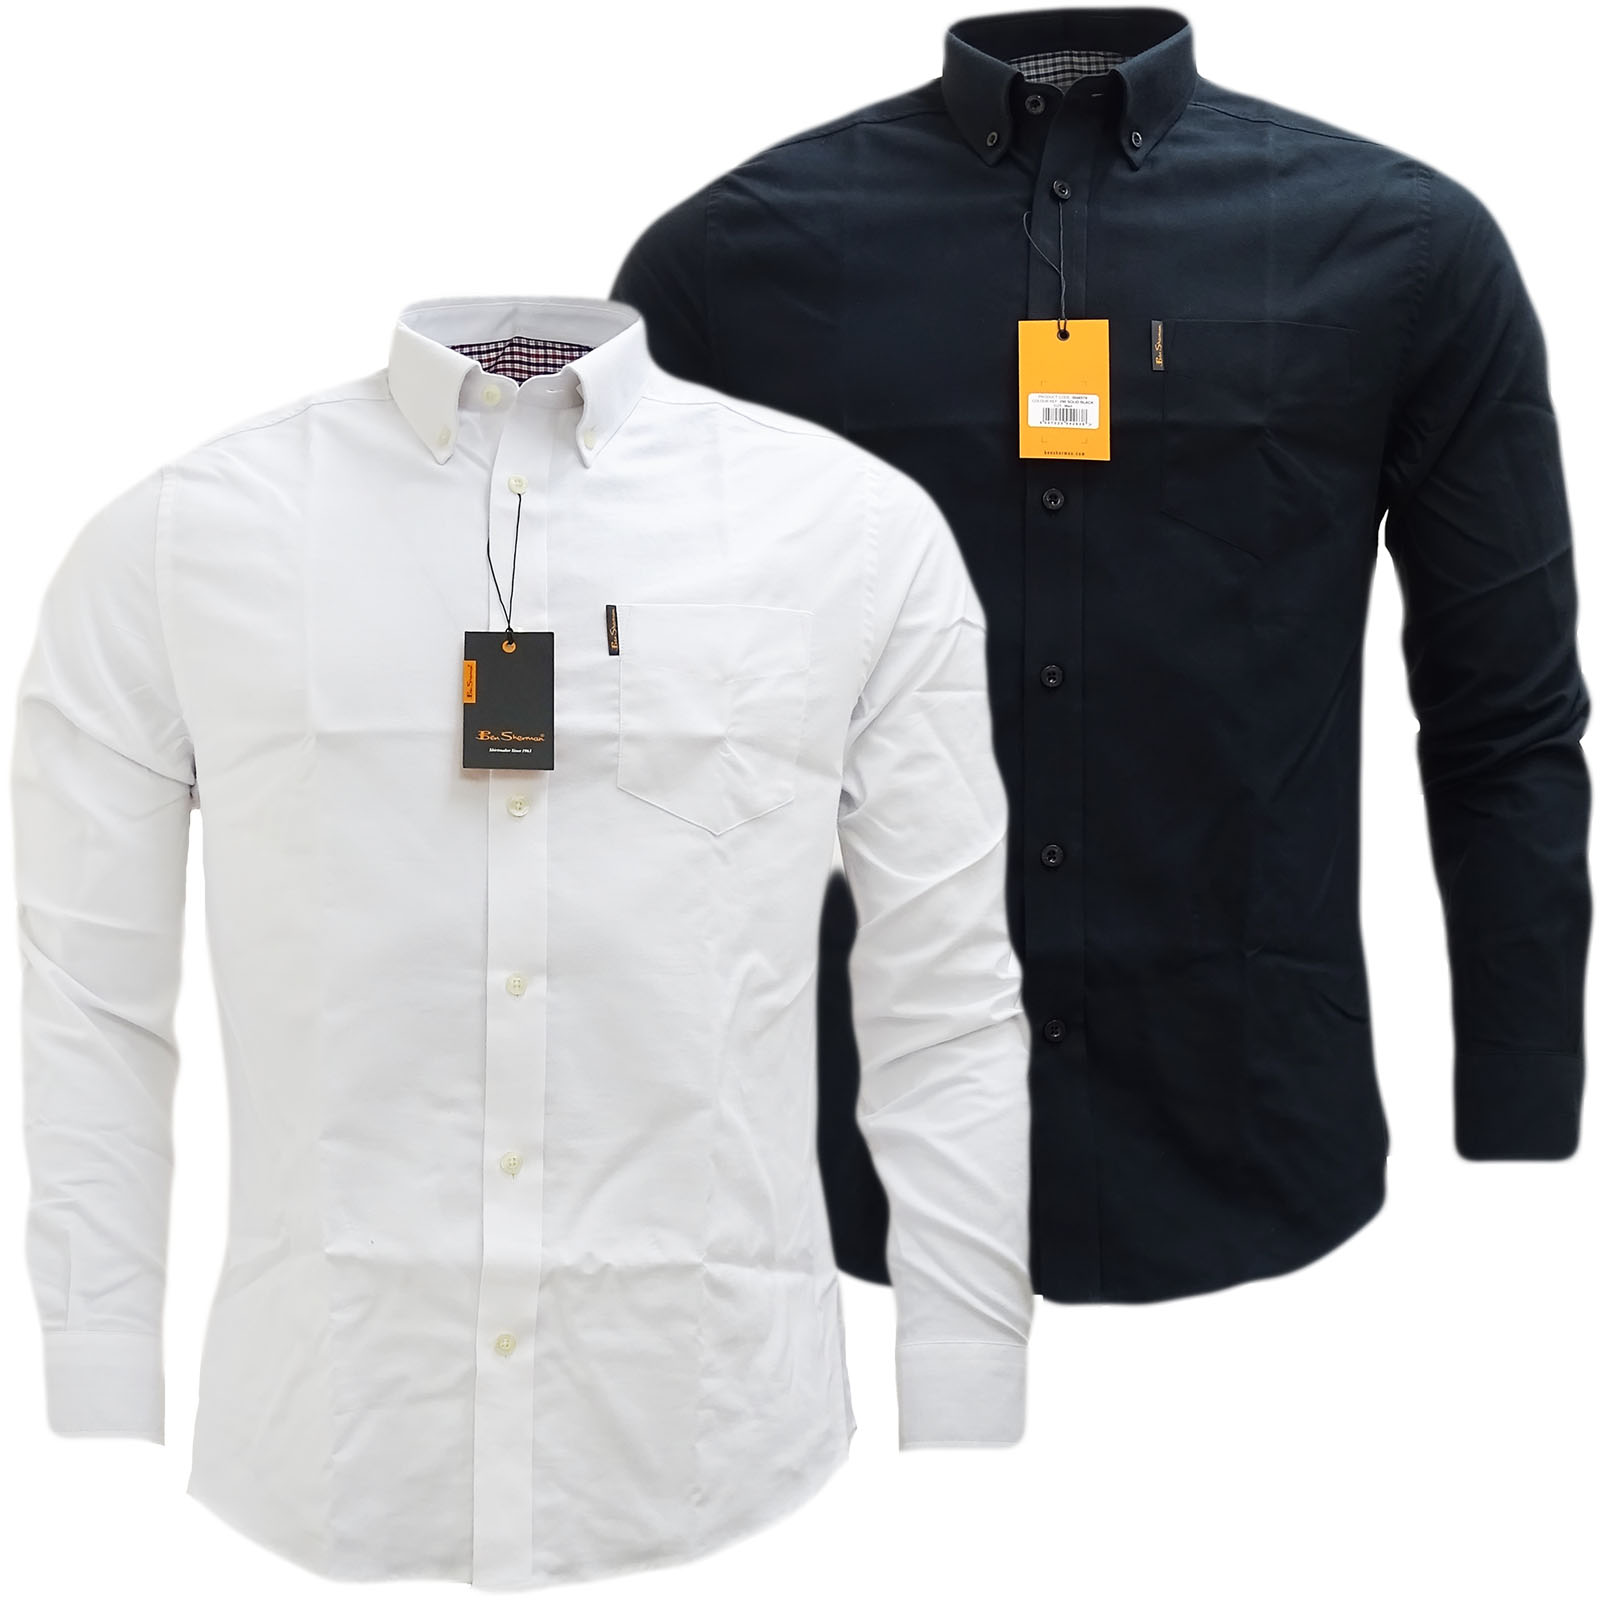 Ben Sherman Plain Oxford With Check Under Cuffs Shirt 48578